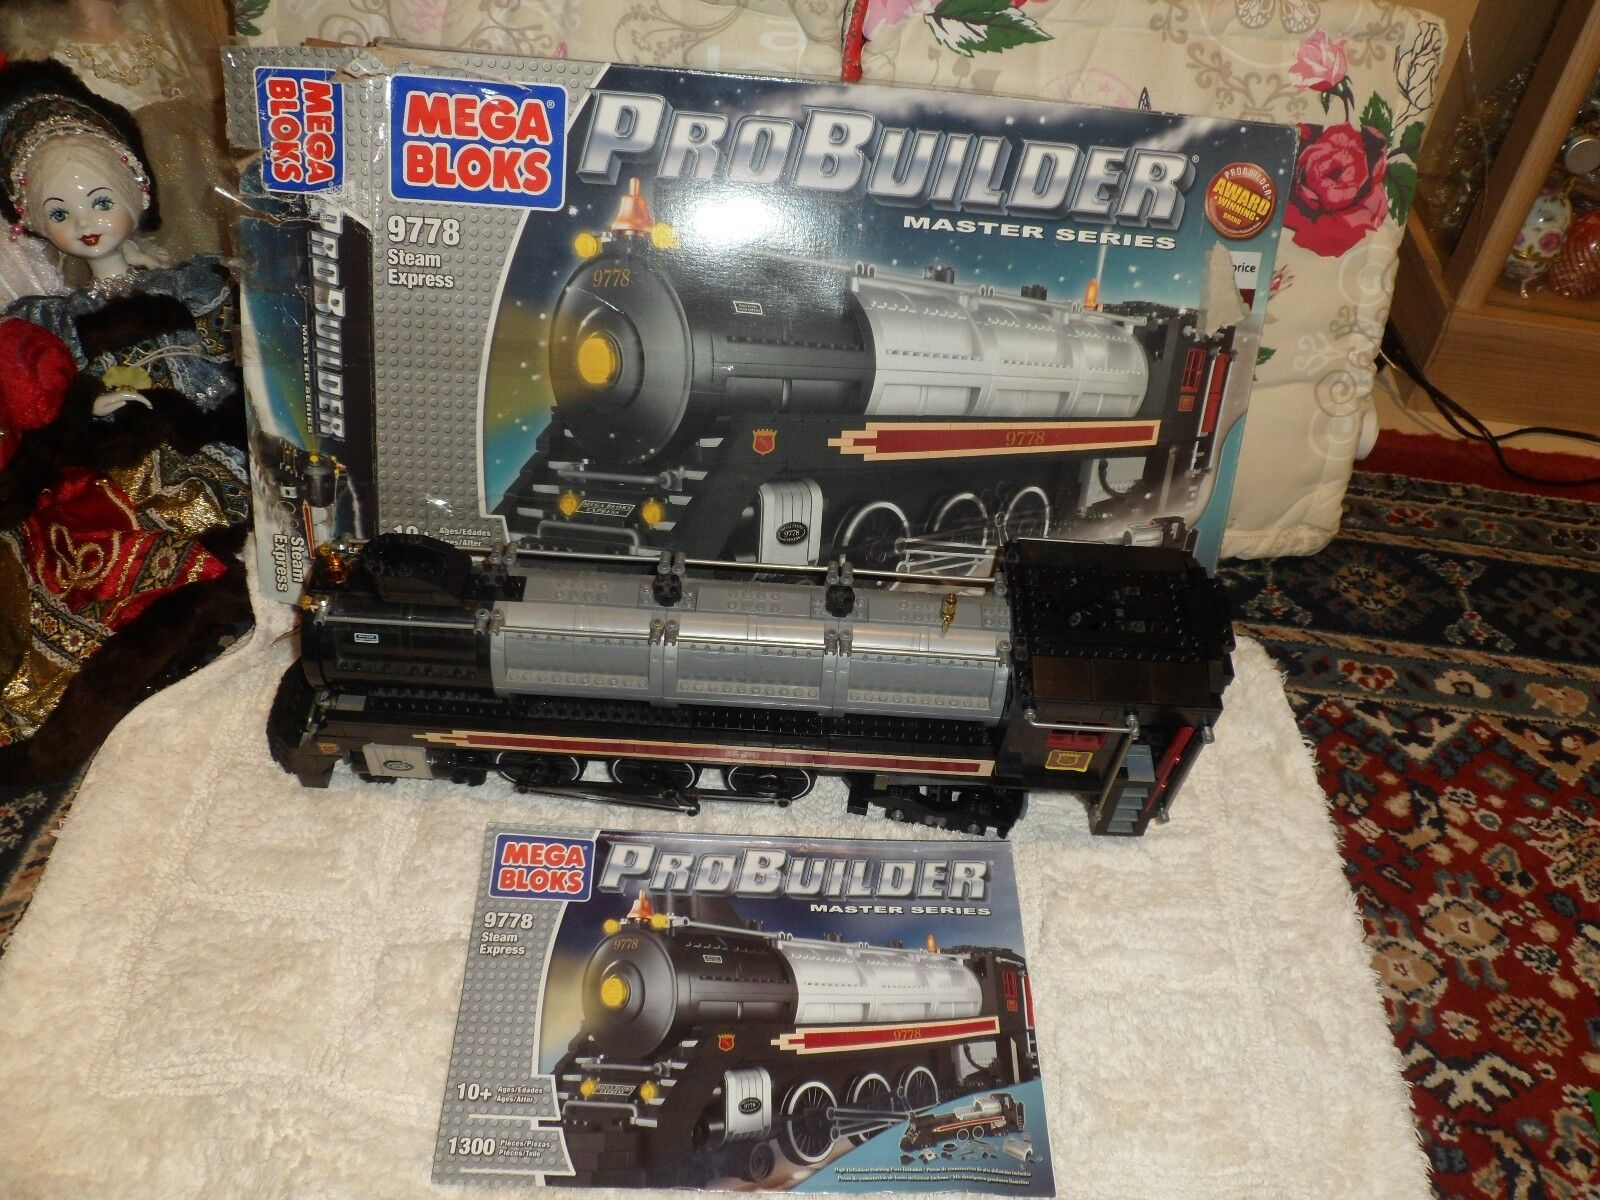 MEGA BLOKS PRO-BUILDER MASTER SERIES - 9778 Steam Express, 1300 PCS, 10+, 2004